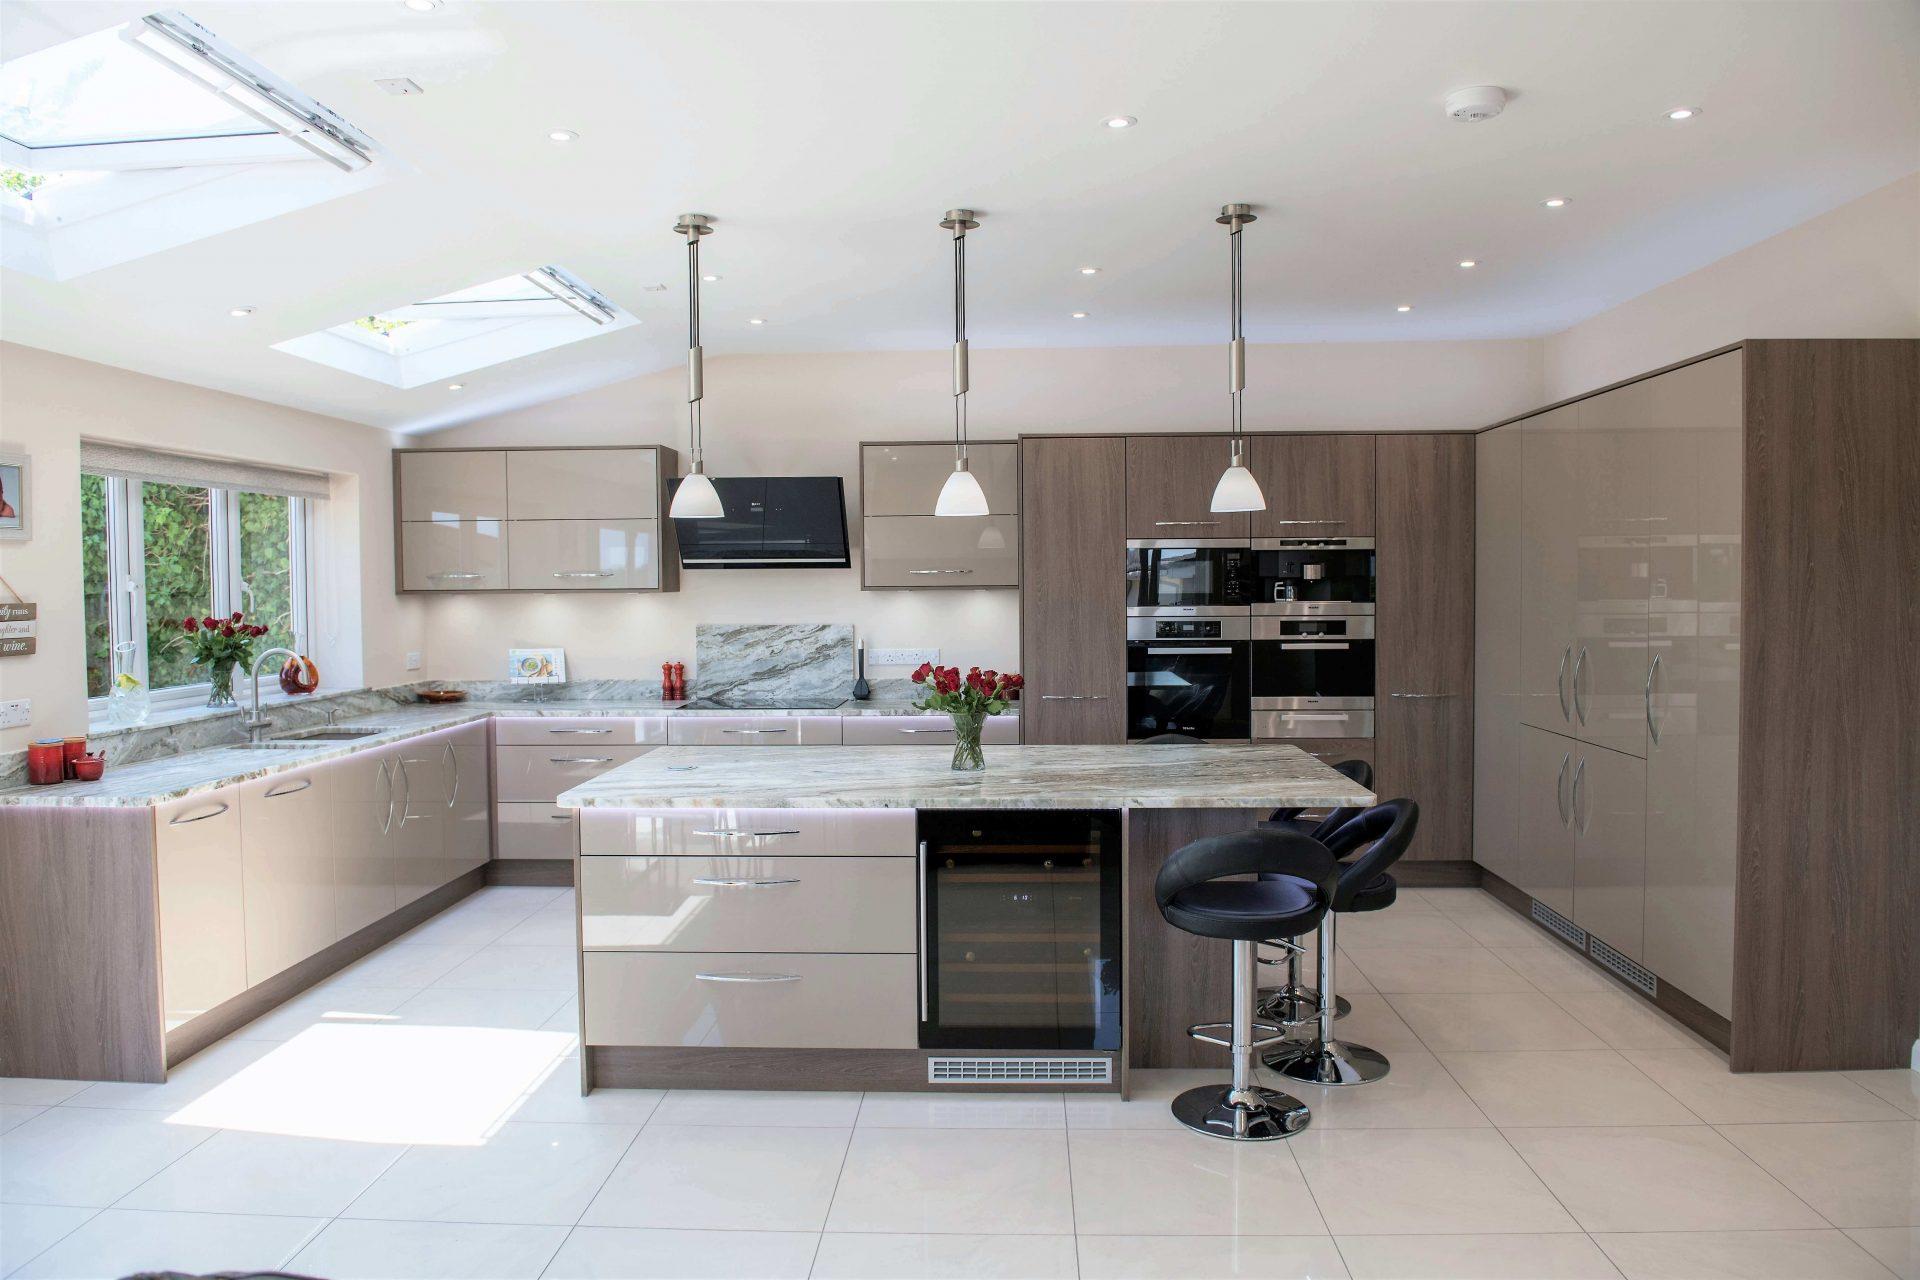 New Forest Bespoke Kitchens